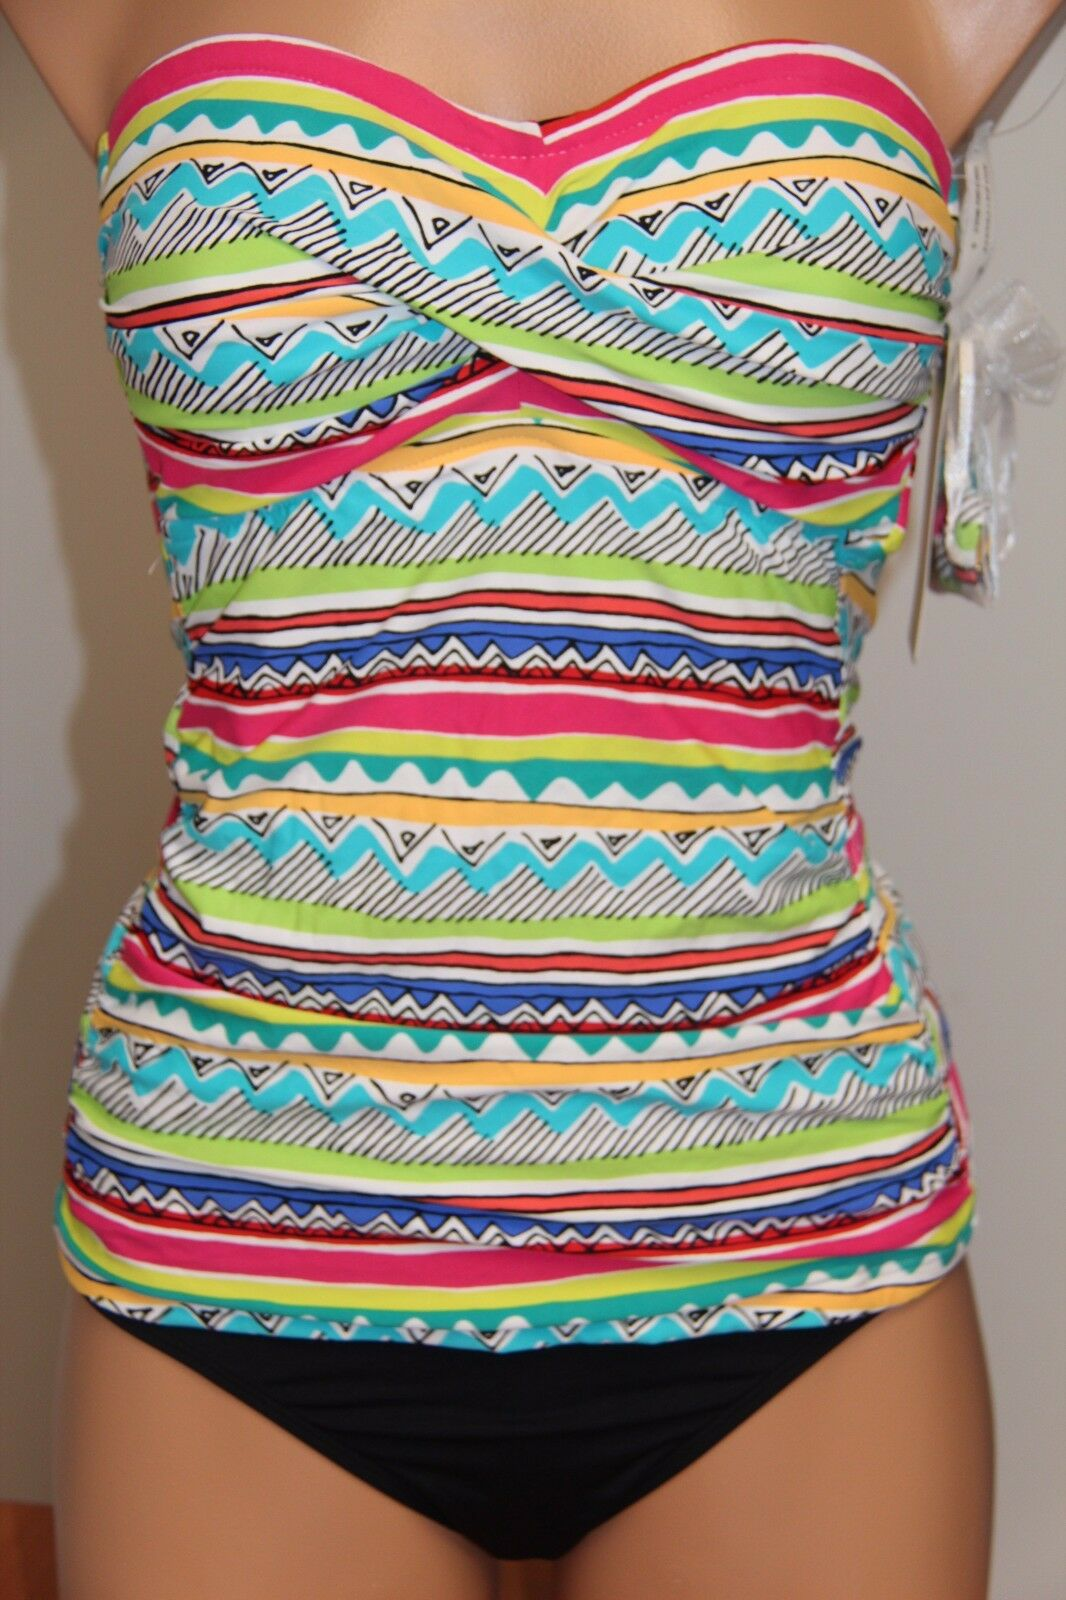 NWT Anne Cole Swimsuit Bikini Tankini 2 pc set Sz S Strap